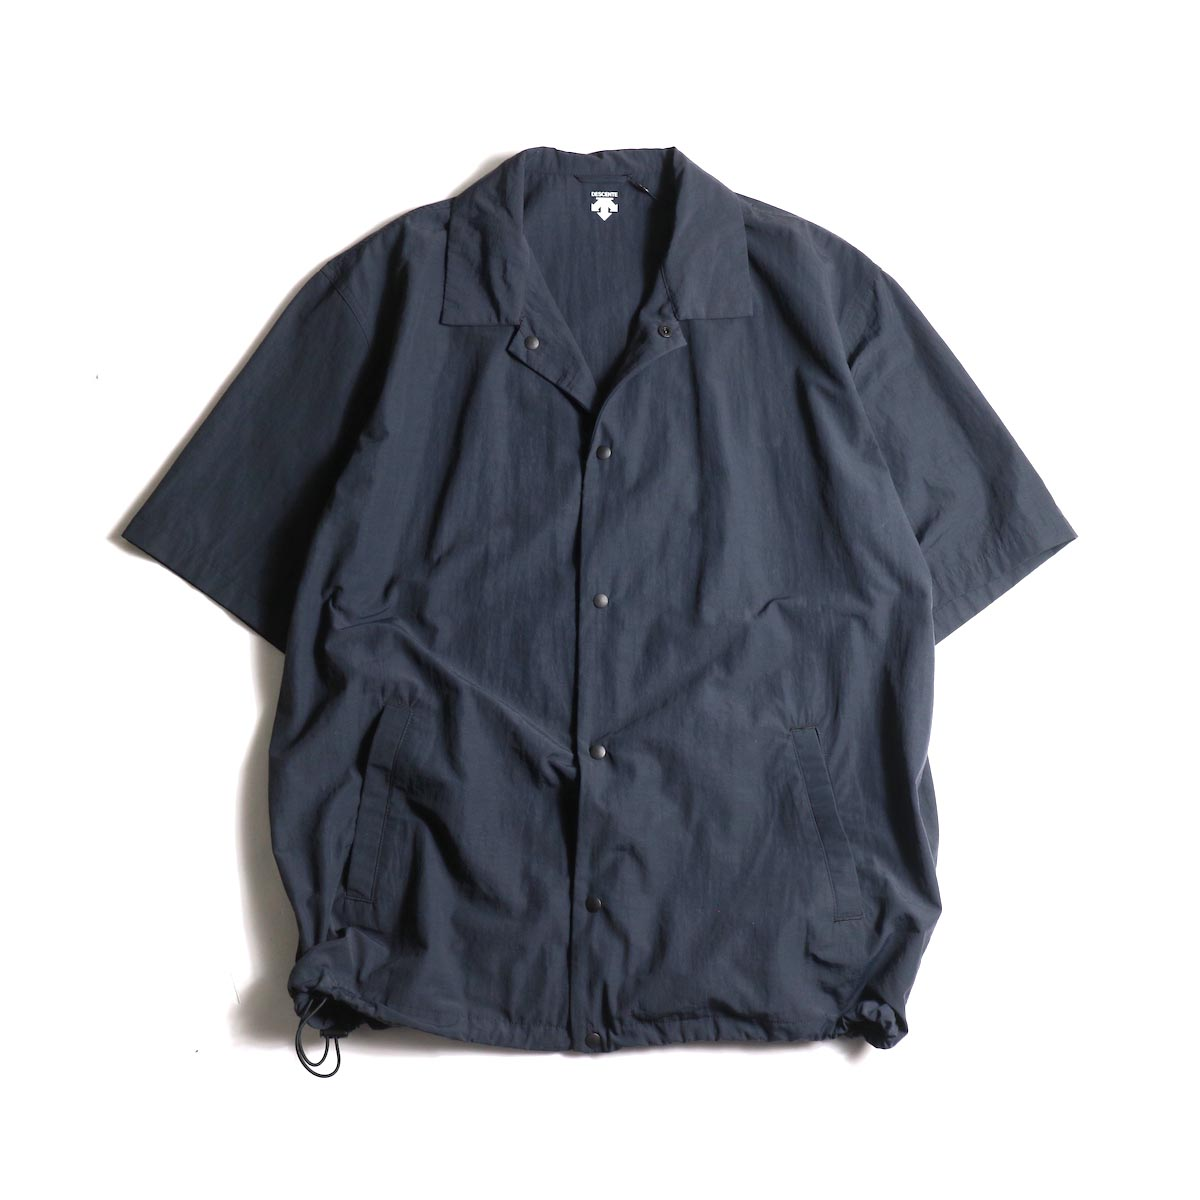 DESCENTE ddd / COACH SHIRT (Black)正面